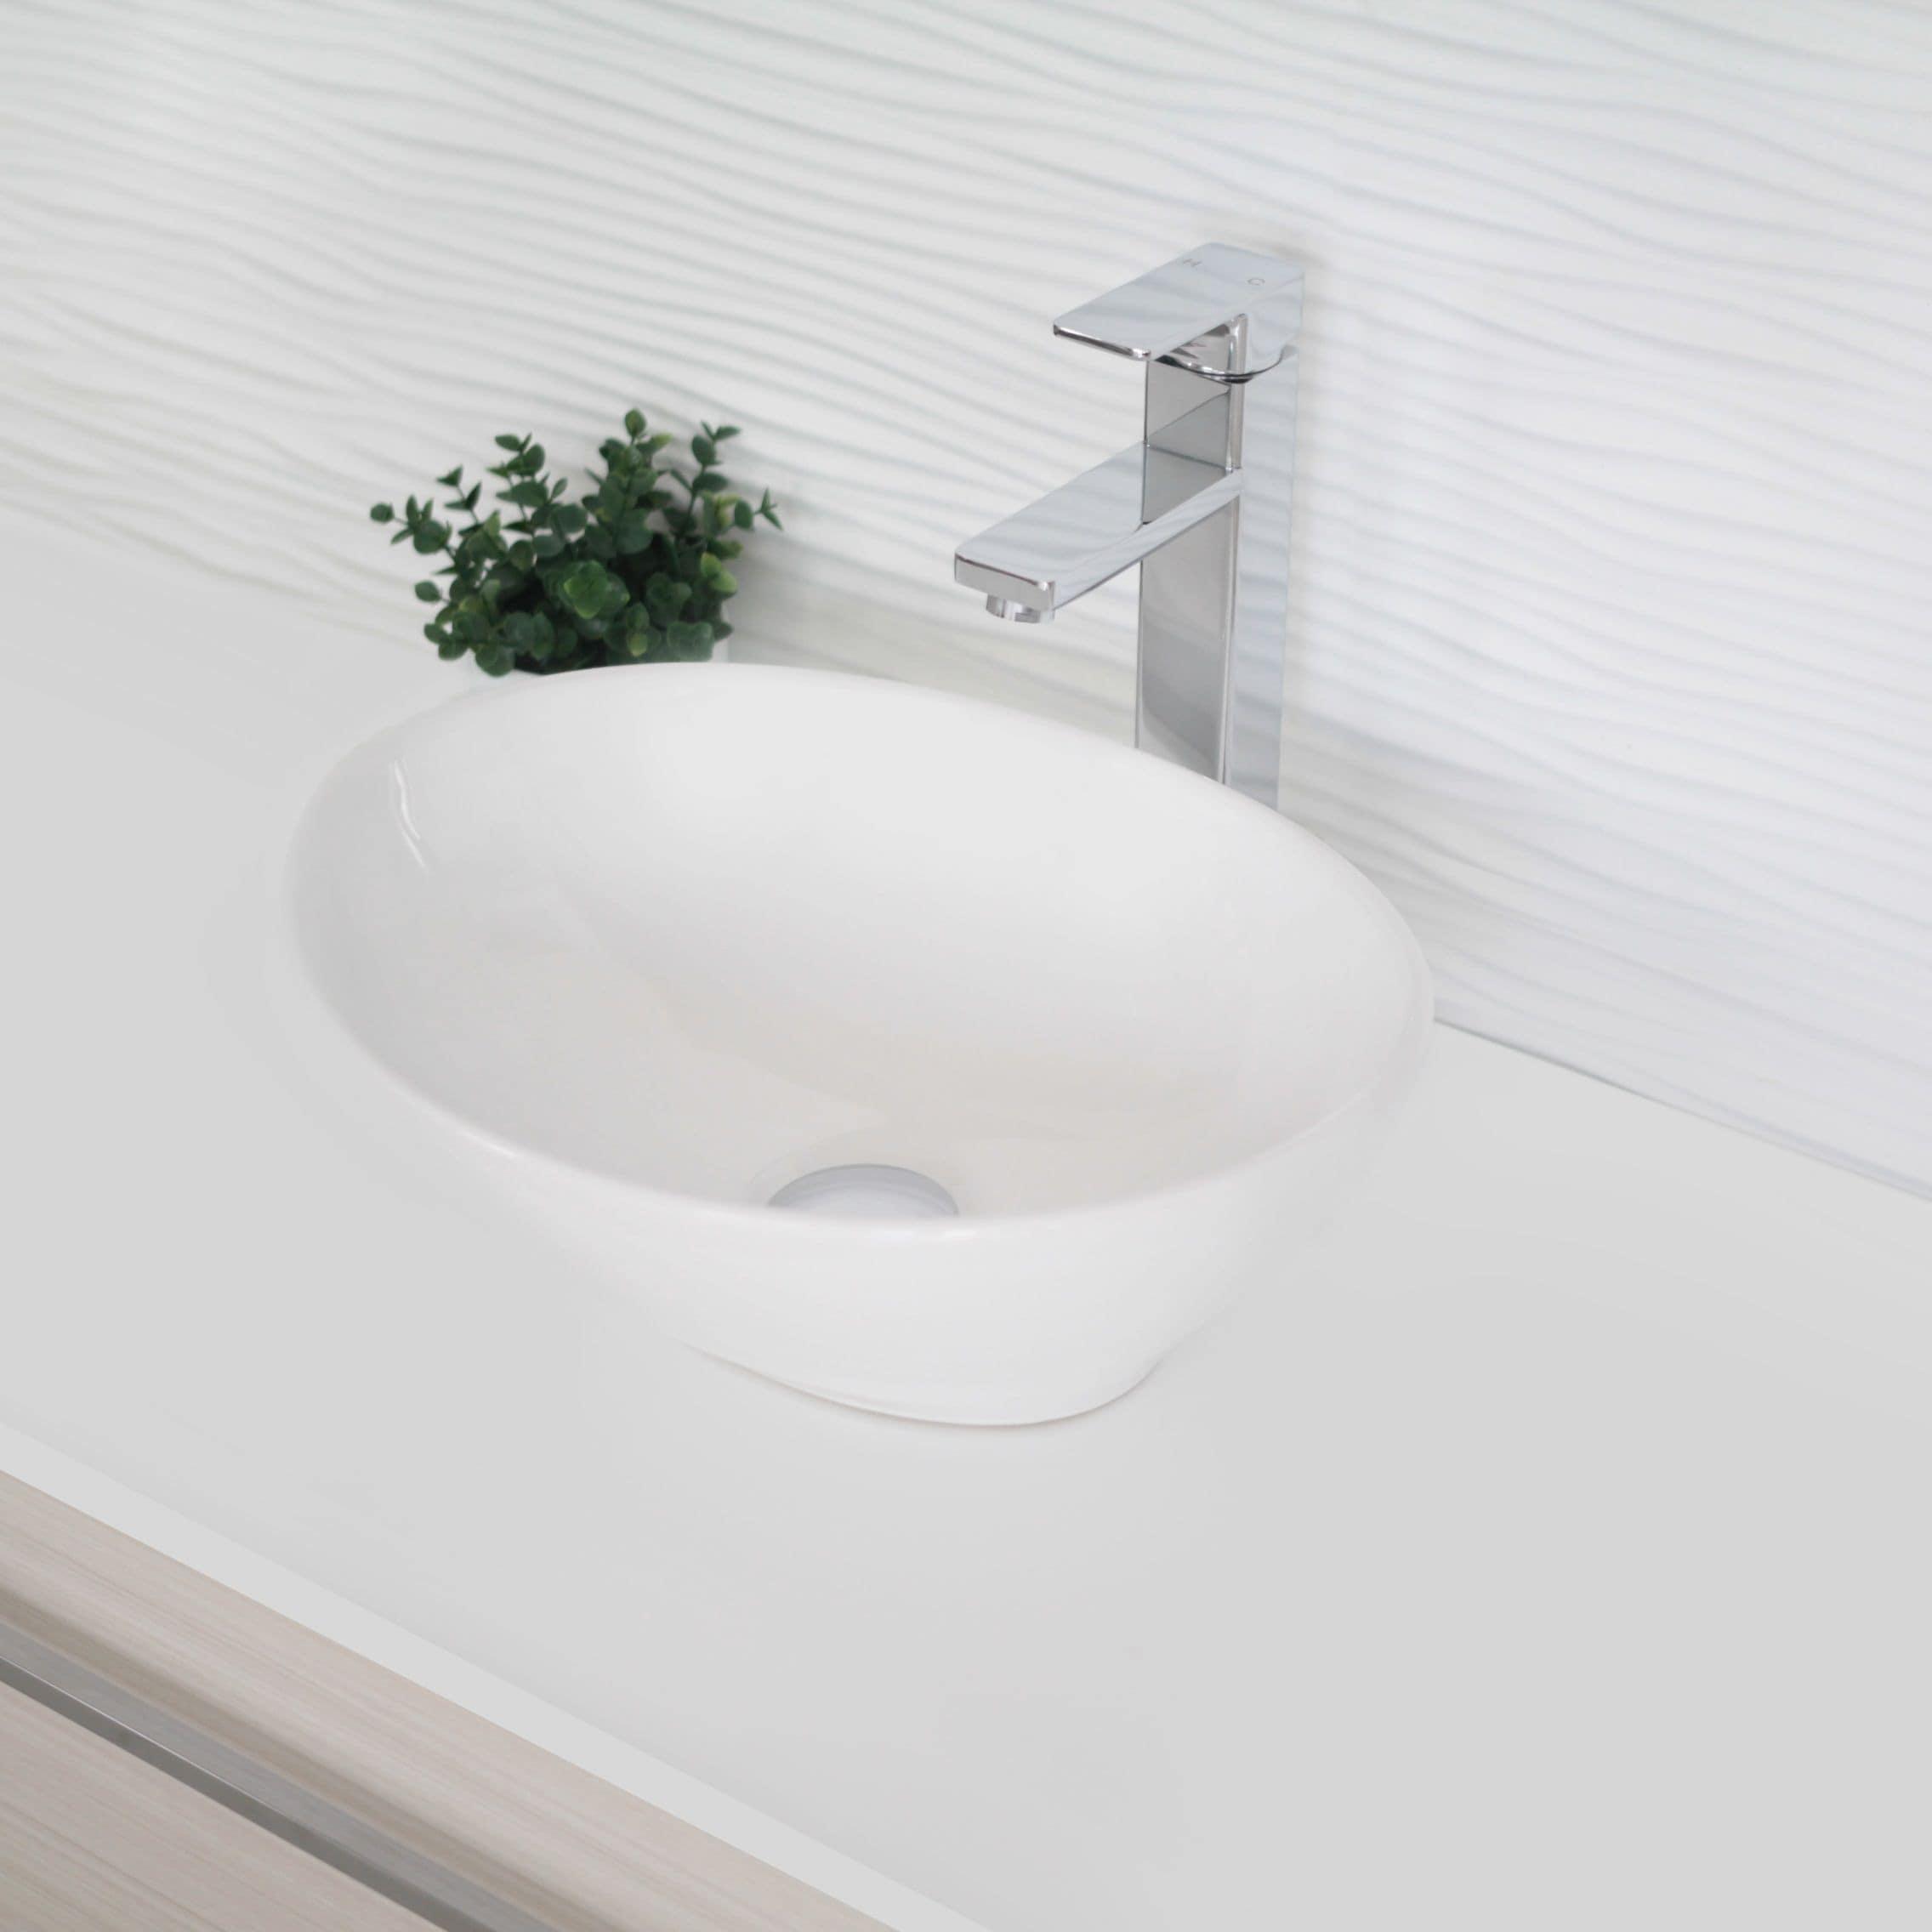 Stylish 15 Inch White Oval Ceramic Vessel Bathroom Sink 15 3 4 L X 13 3 8 W X 5 3 4 D Overstock 29014429